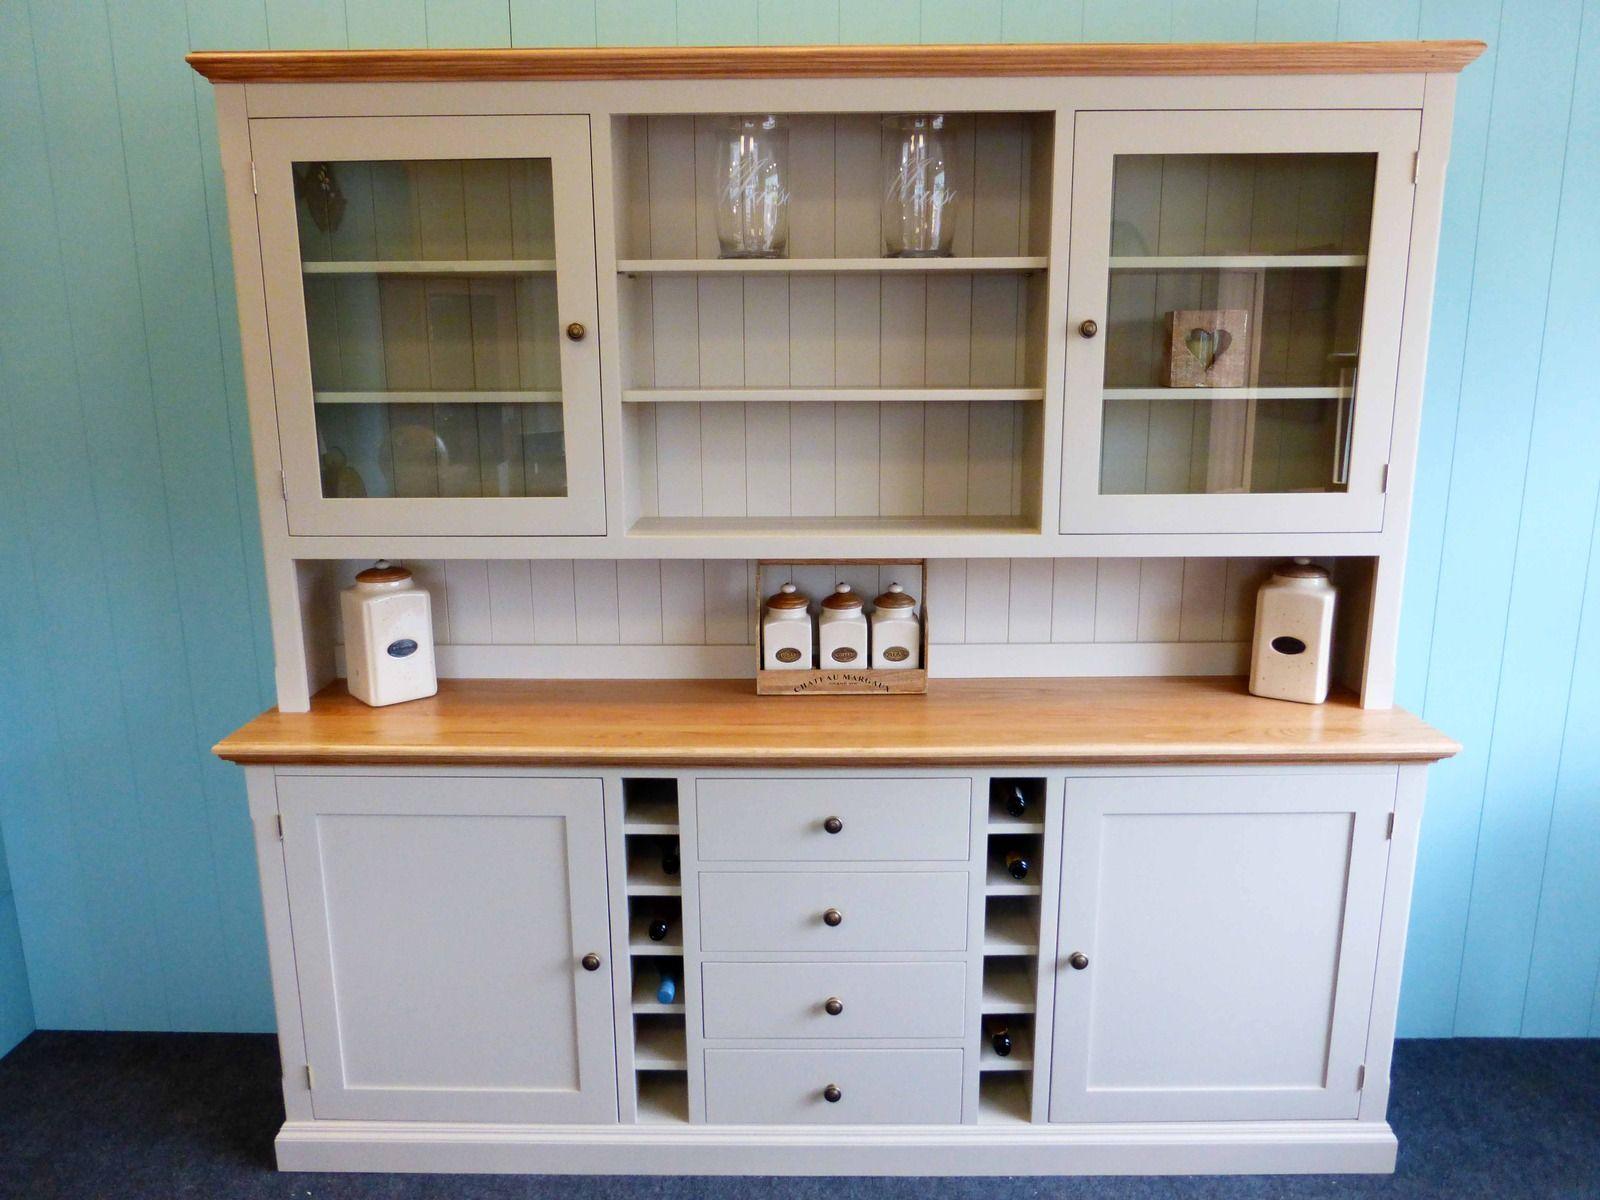 Bespoke Painted Dresser With Wine rack - Bespoke Kitchen ...